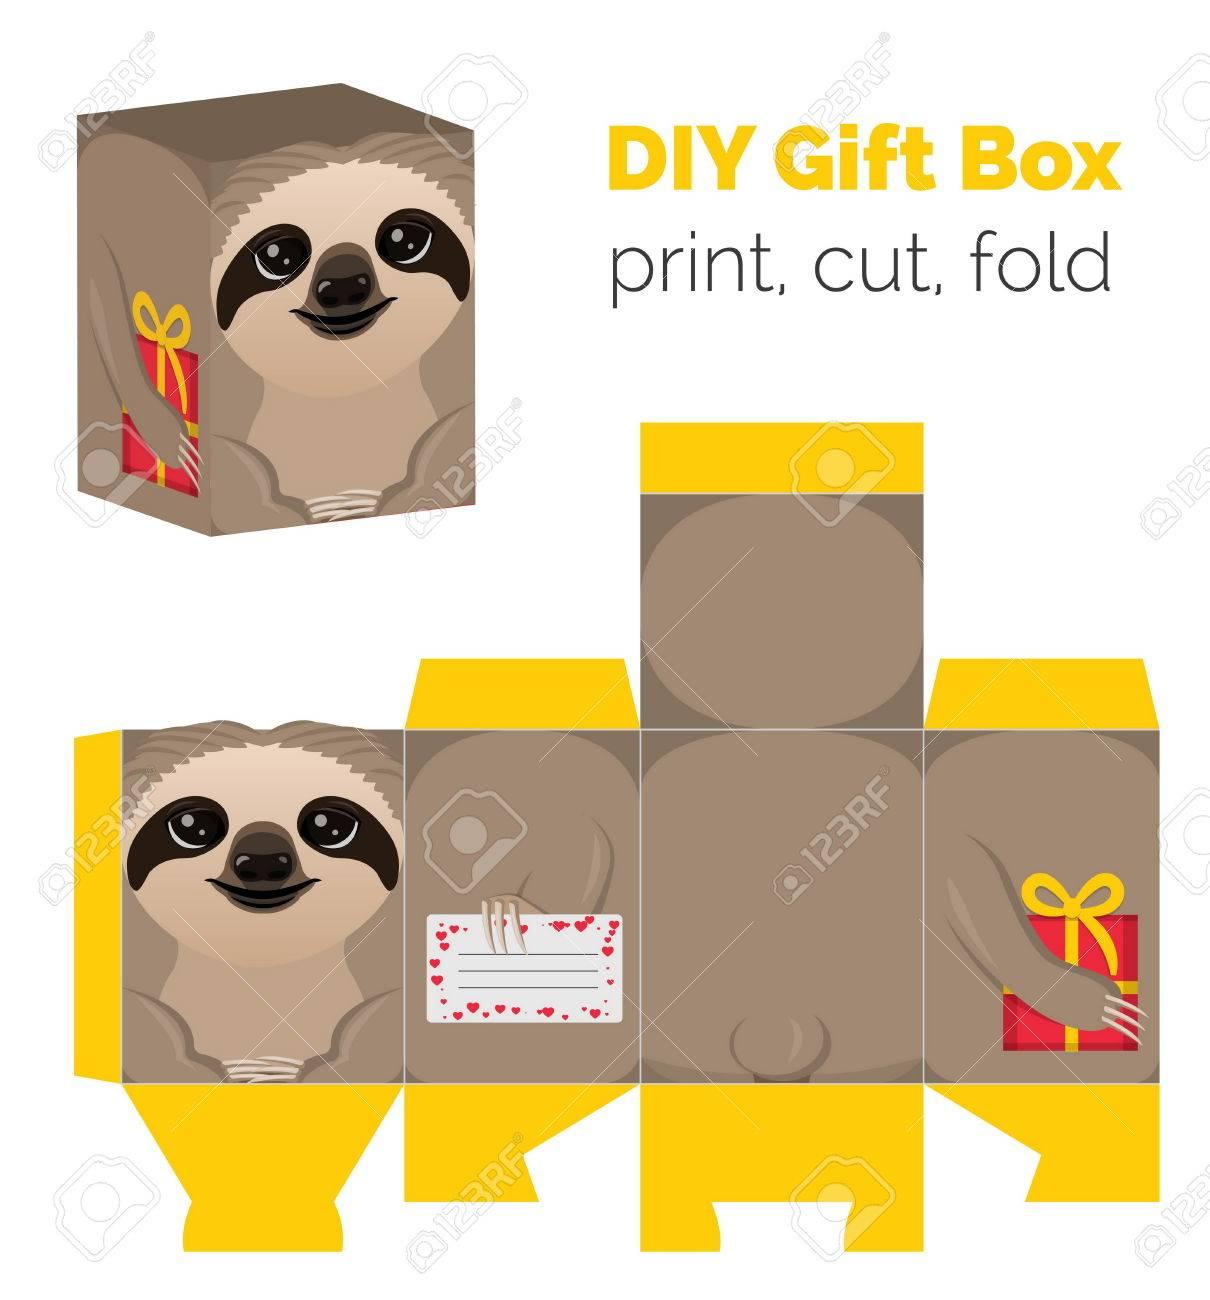 Adorable do it yourself diy sloth gift box for sweets candies adorable do it yourself diy sloth gift box for sweets candies small presents solutioingenieria Choice Image